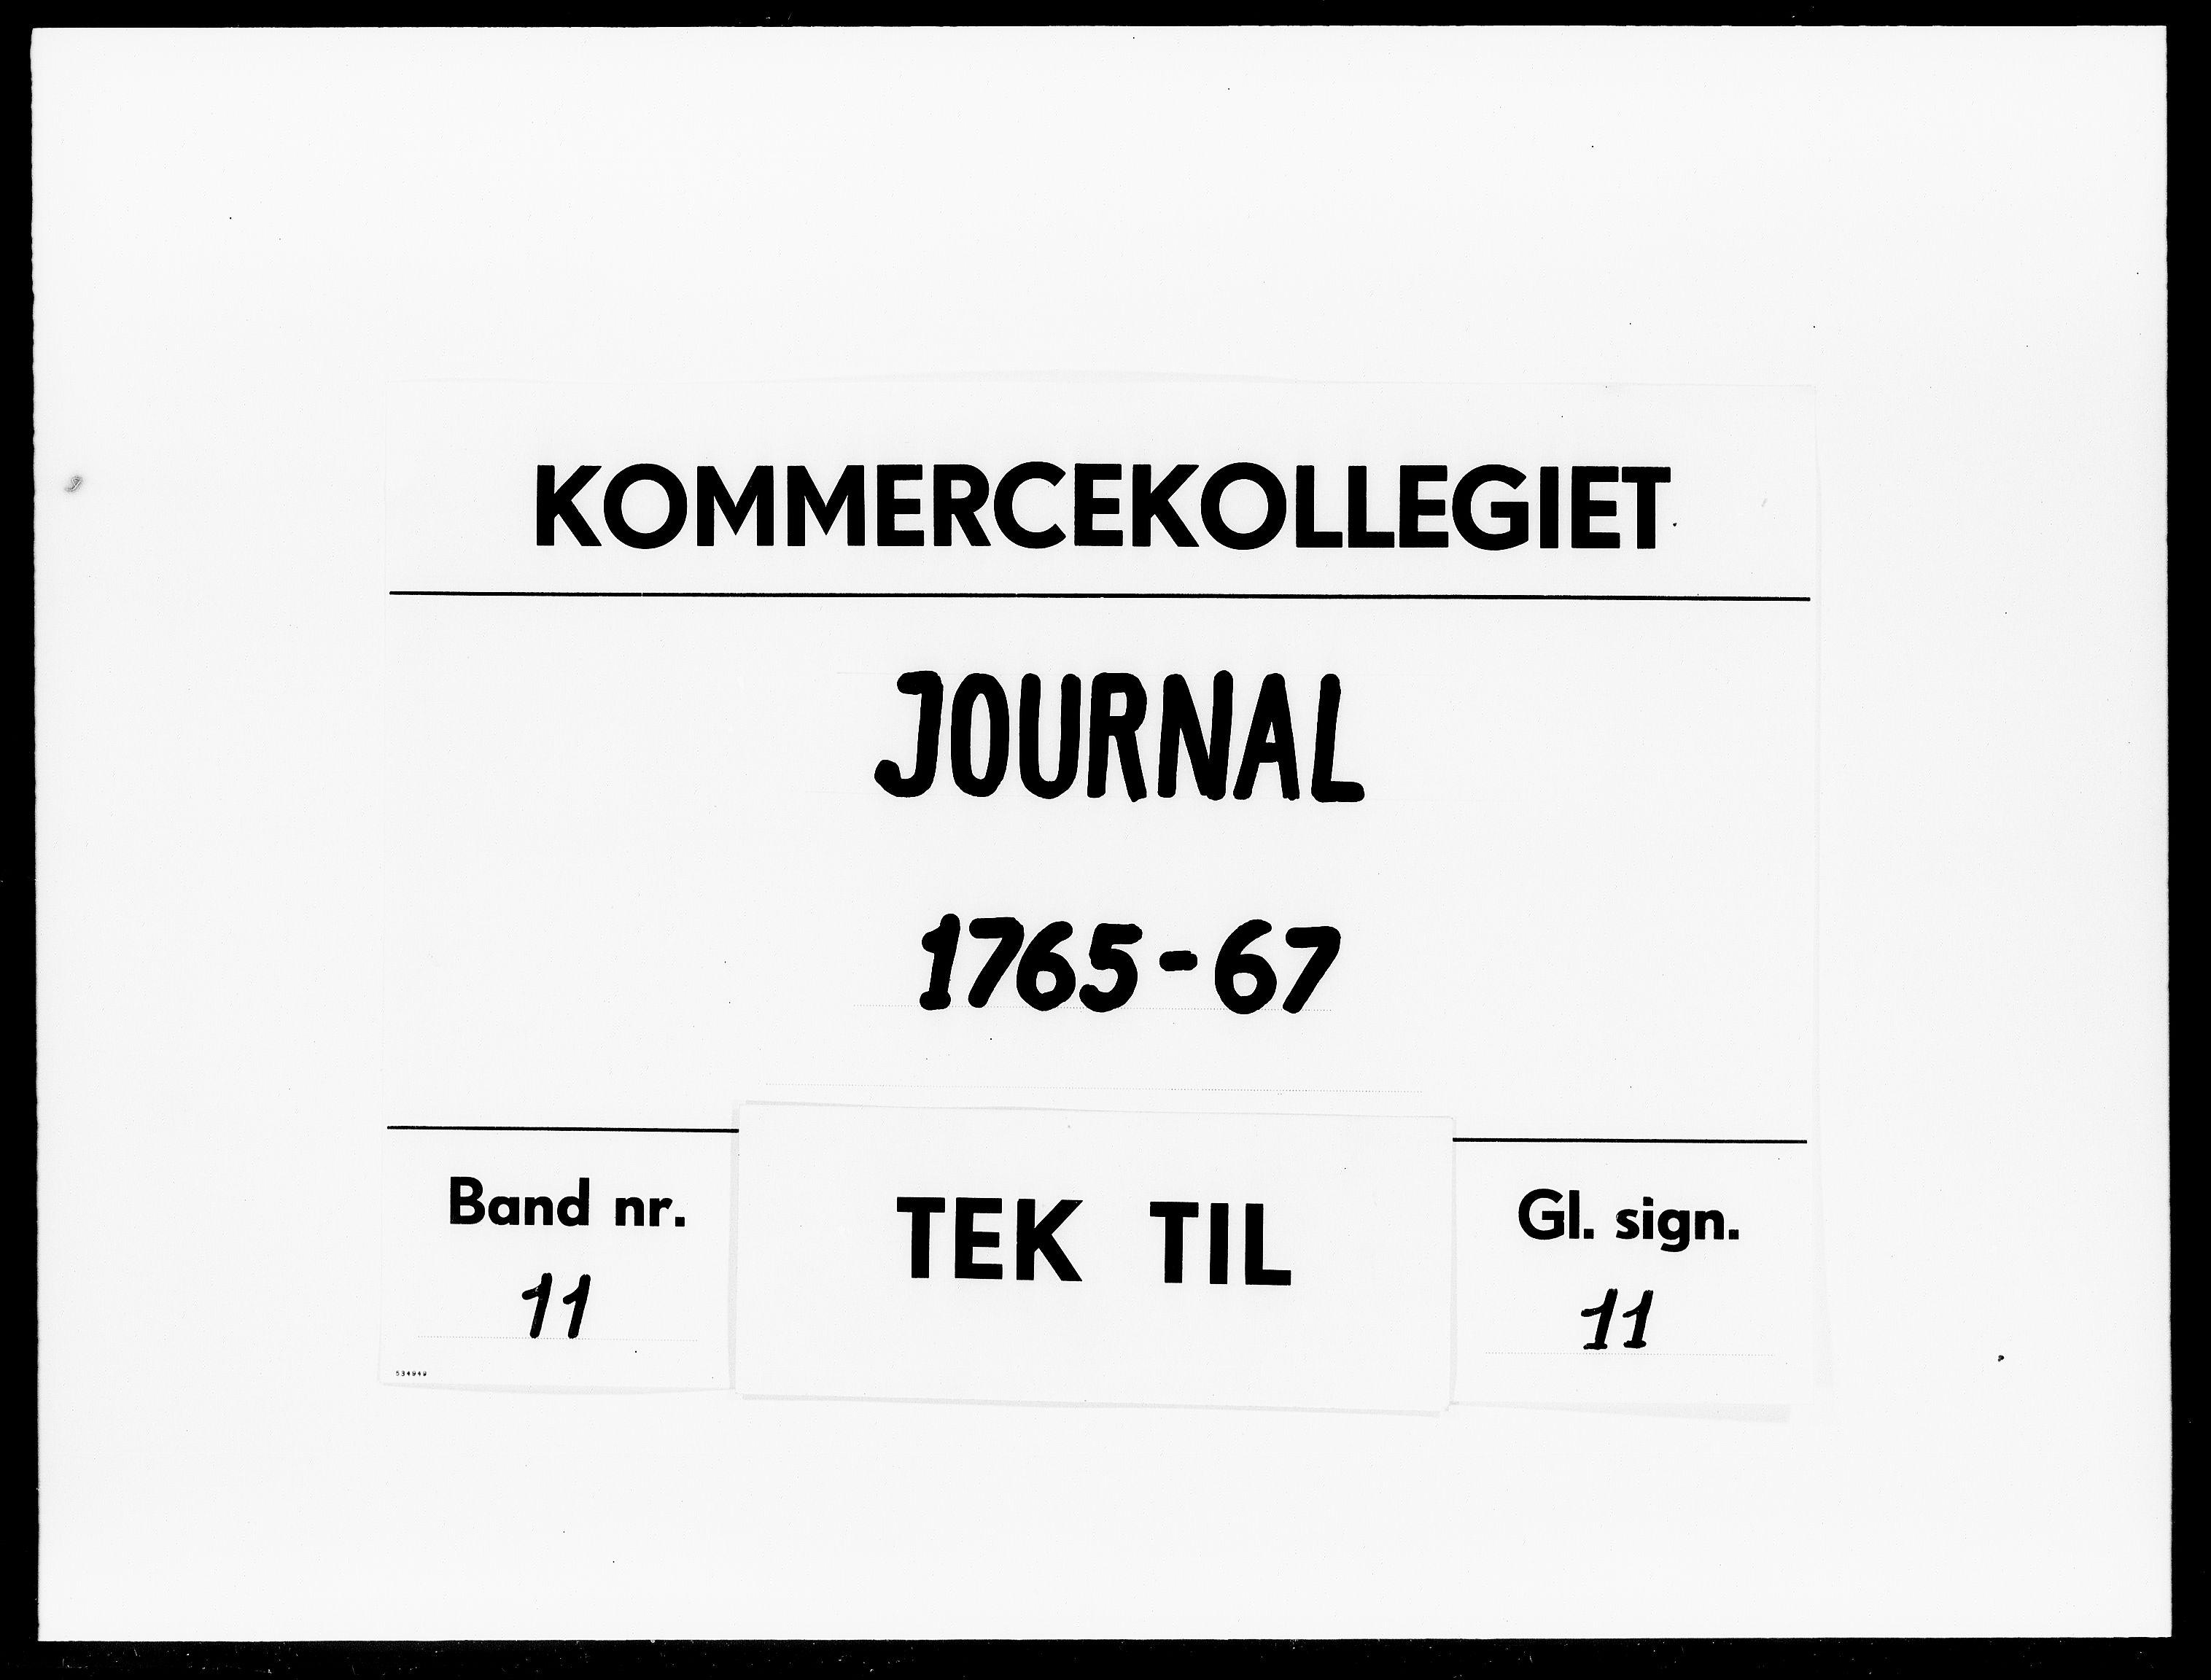 DRA, Kommercekollegiet, Dansk-Norske Sekretariat, -/59: Journal nr. 11, 1765-1767